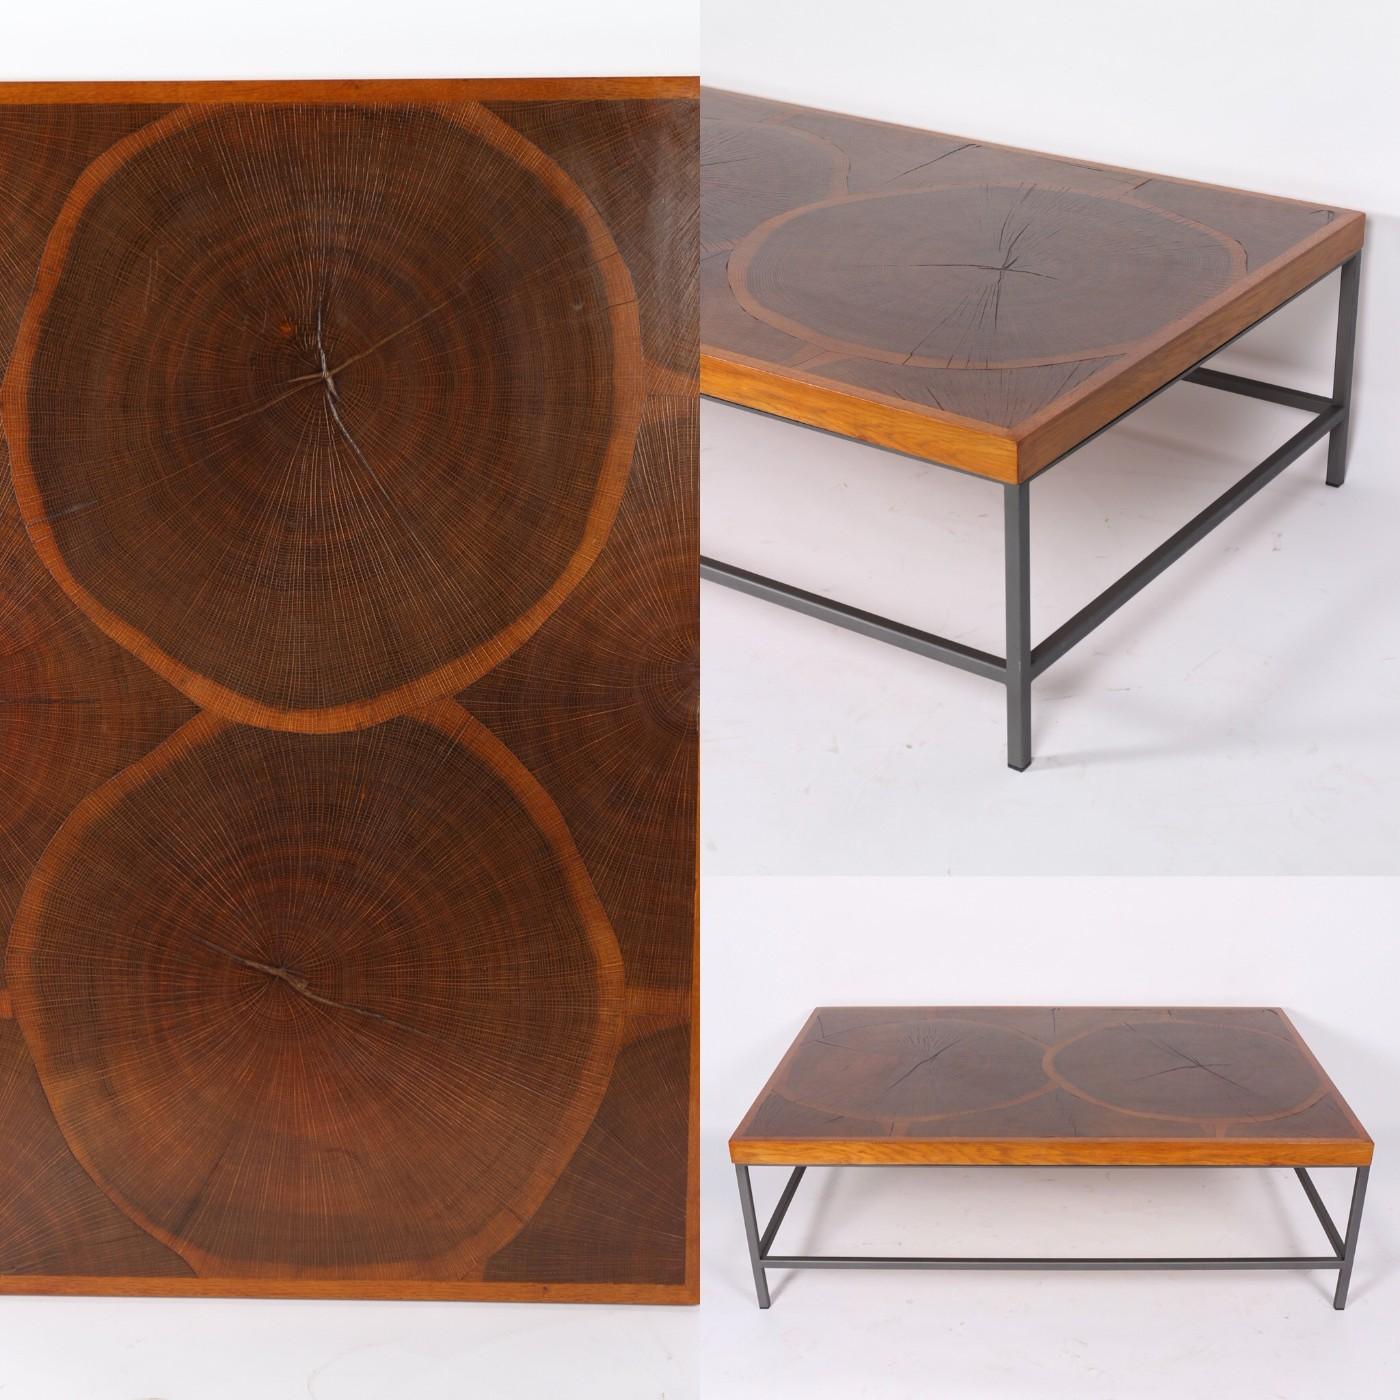 End Grain Coffee Table.Coffee Table With End Grain Oak Top Coffee Tables Frank Van Laer